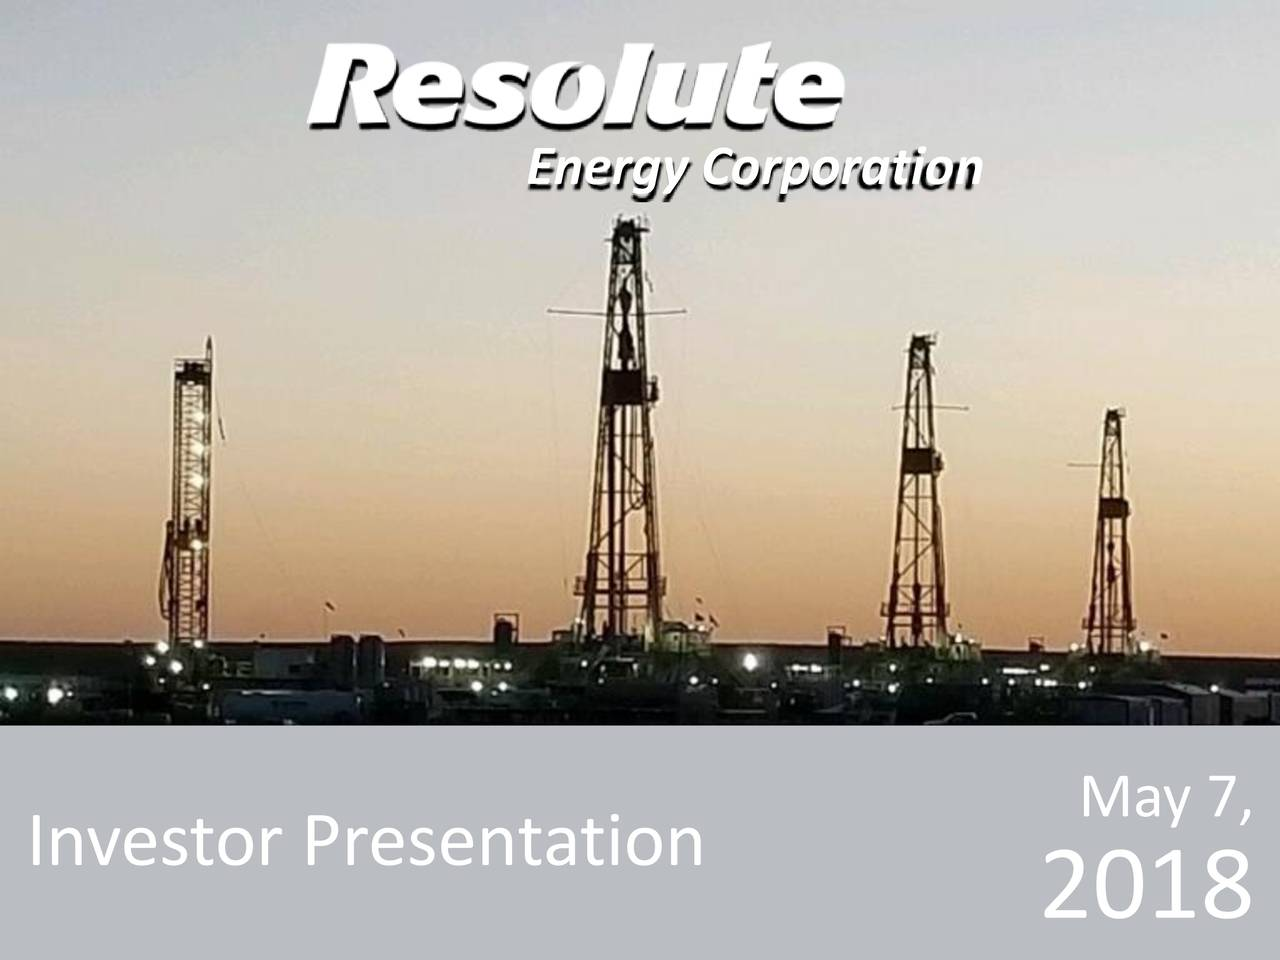 May 7, Investor Presentation 2018